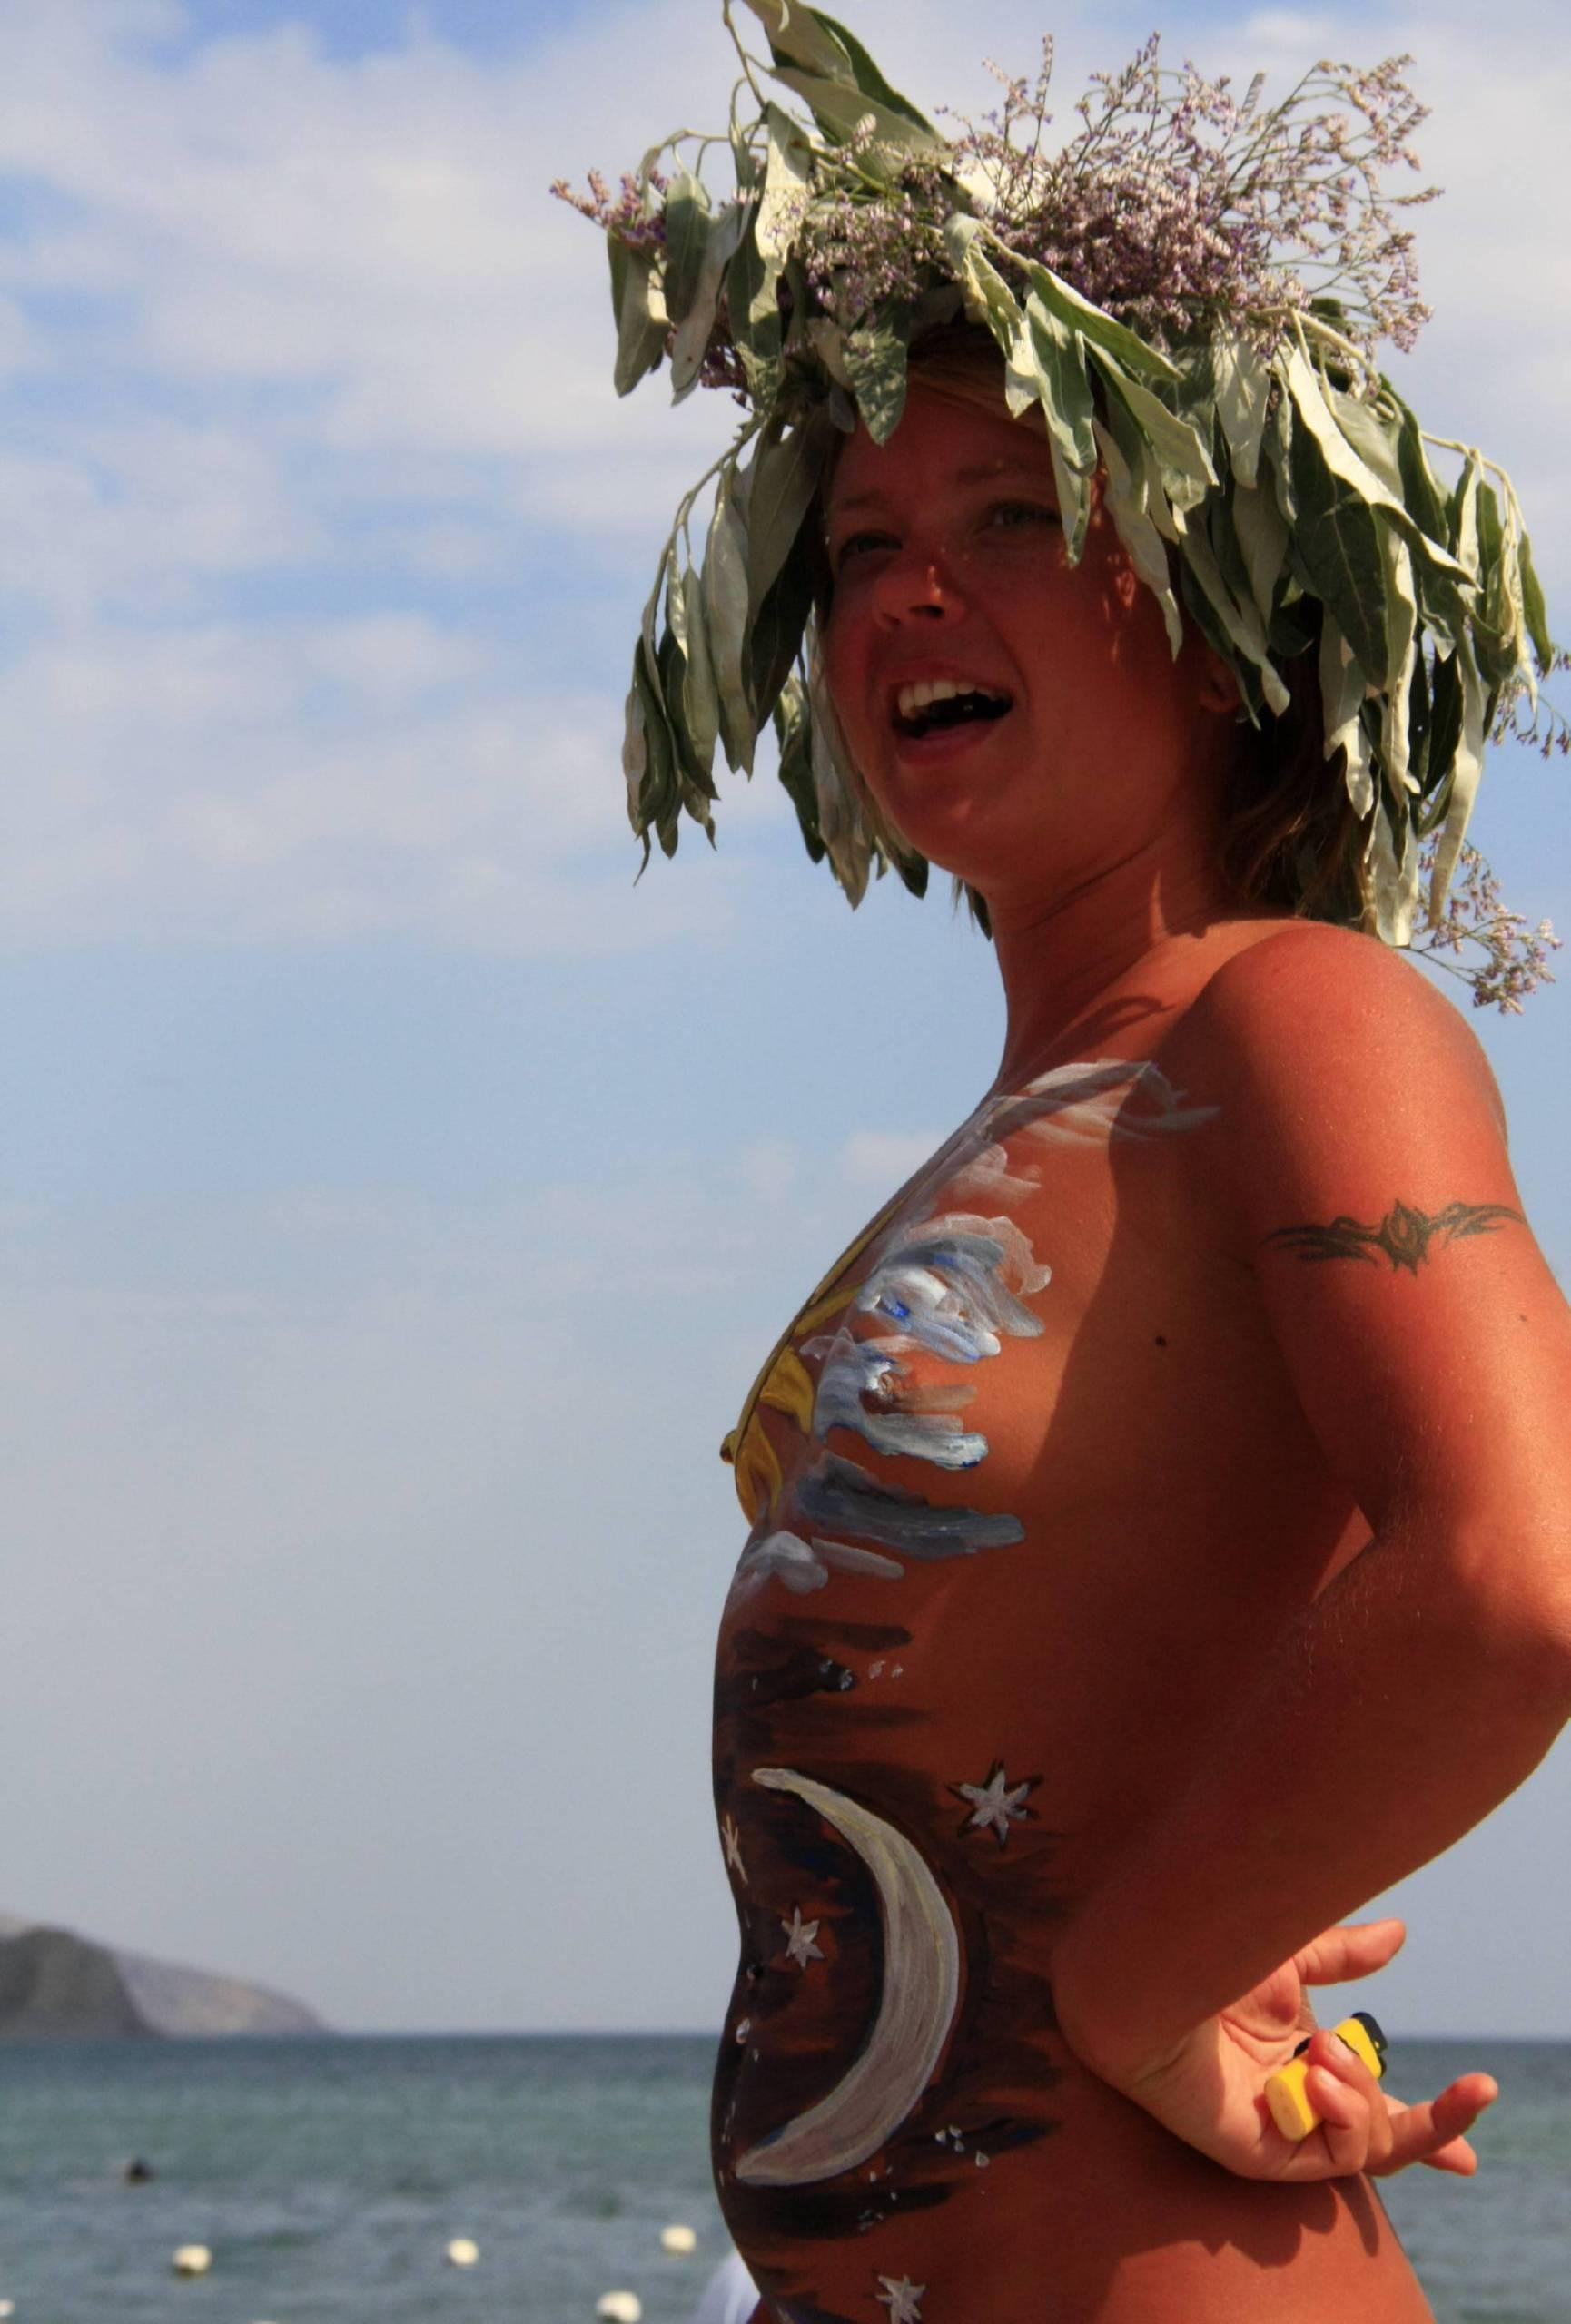 Sand Beach Goddess One - 1